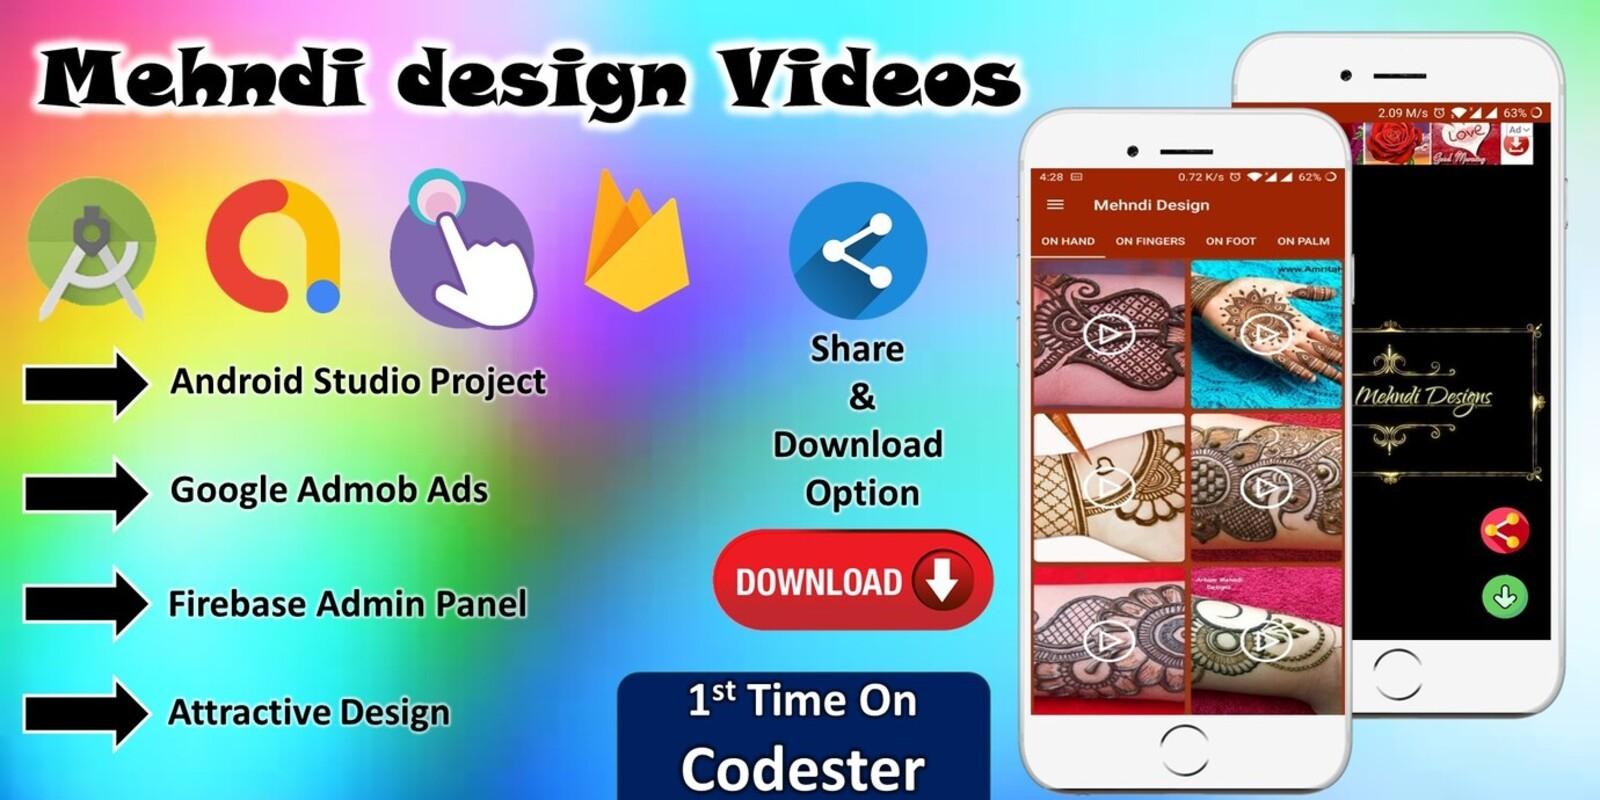 Mehndi Designs Videos Android App Source Code